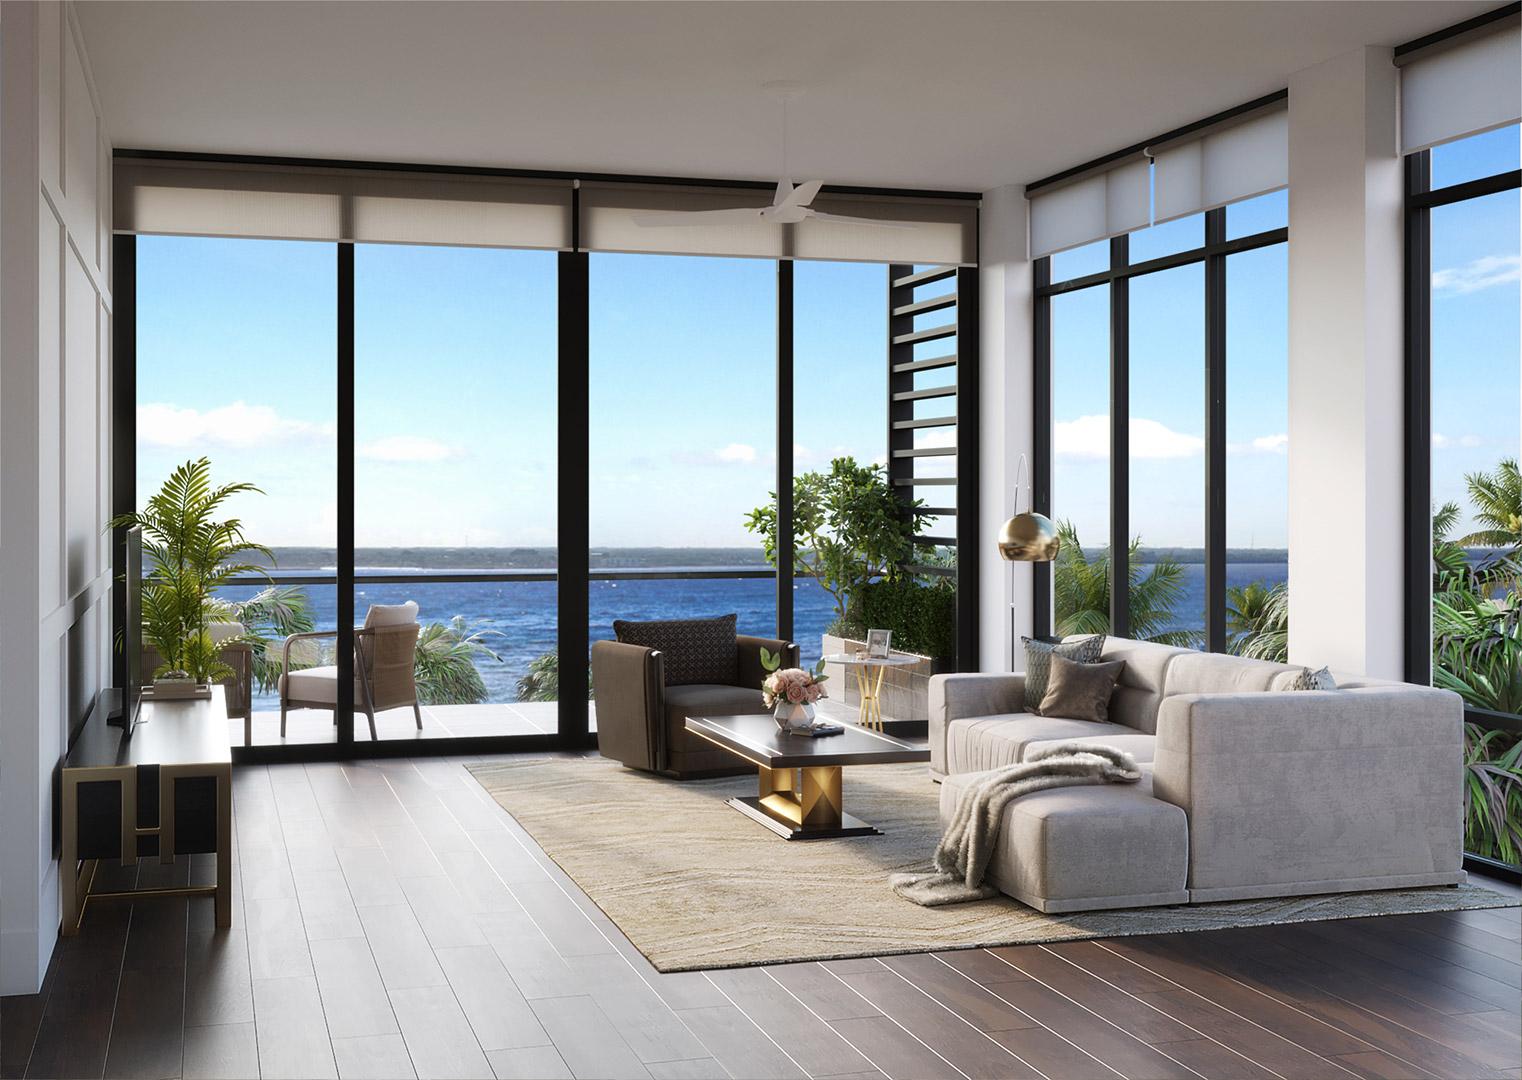 Living room's rendering of the Hudson floor plan